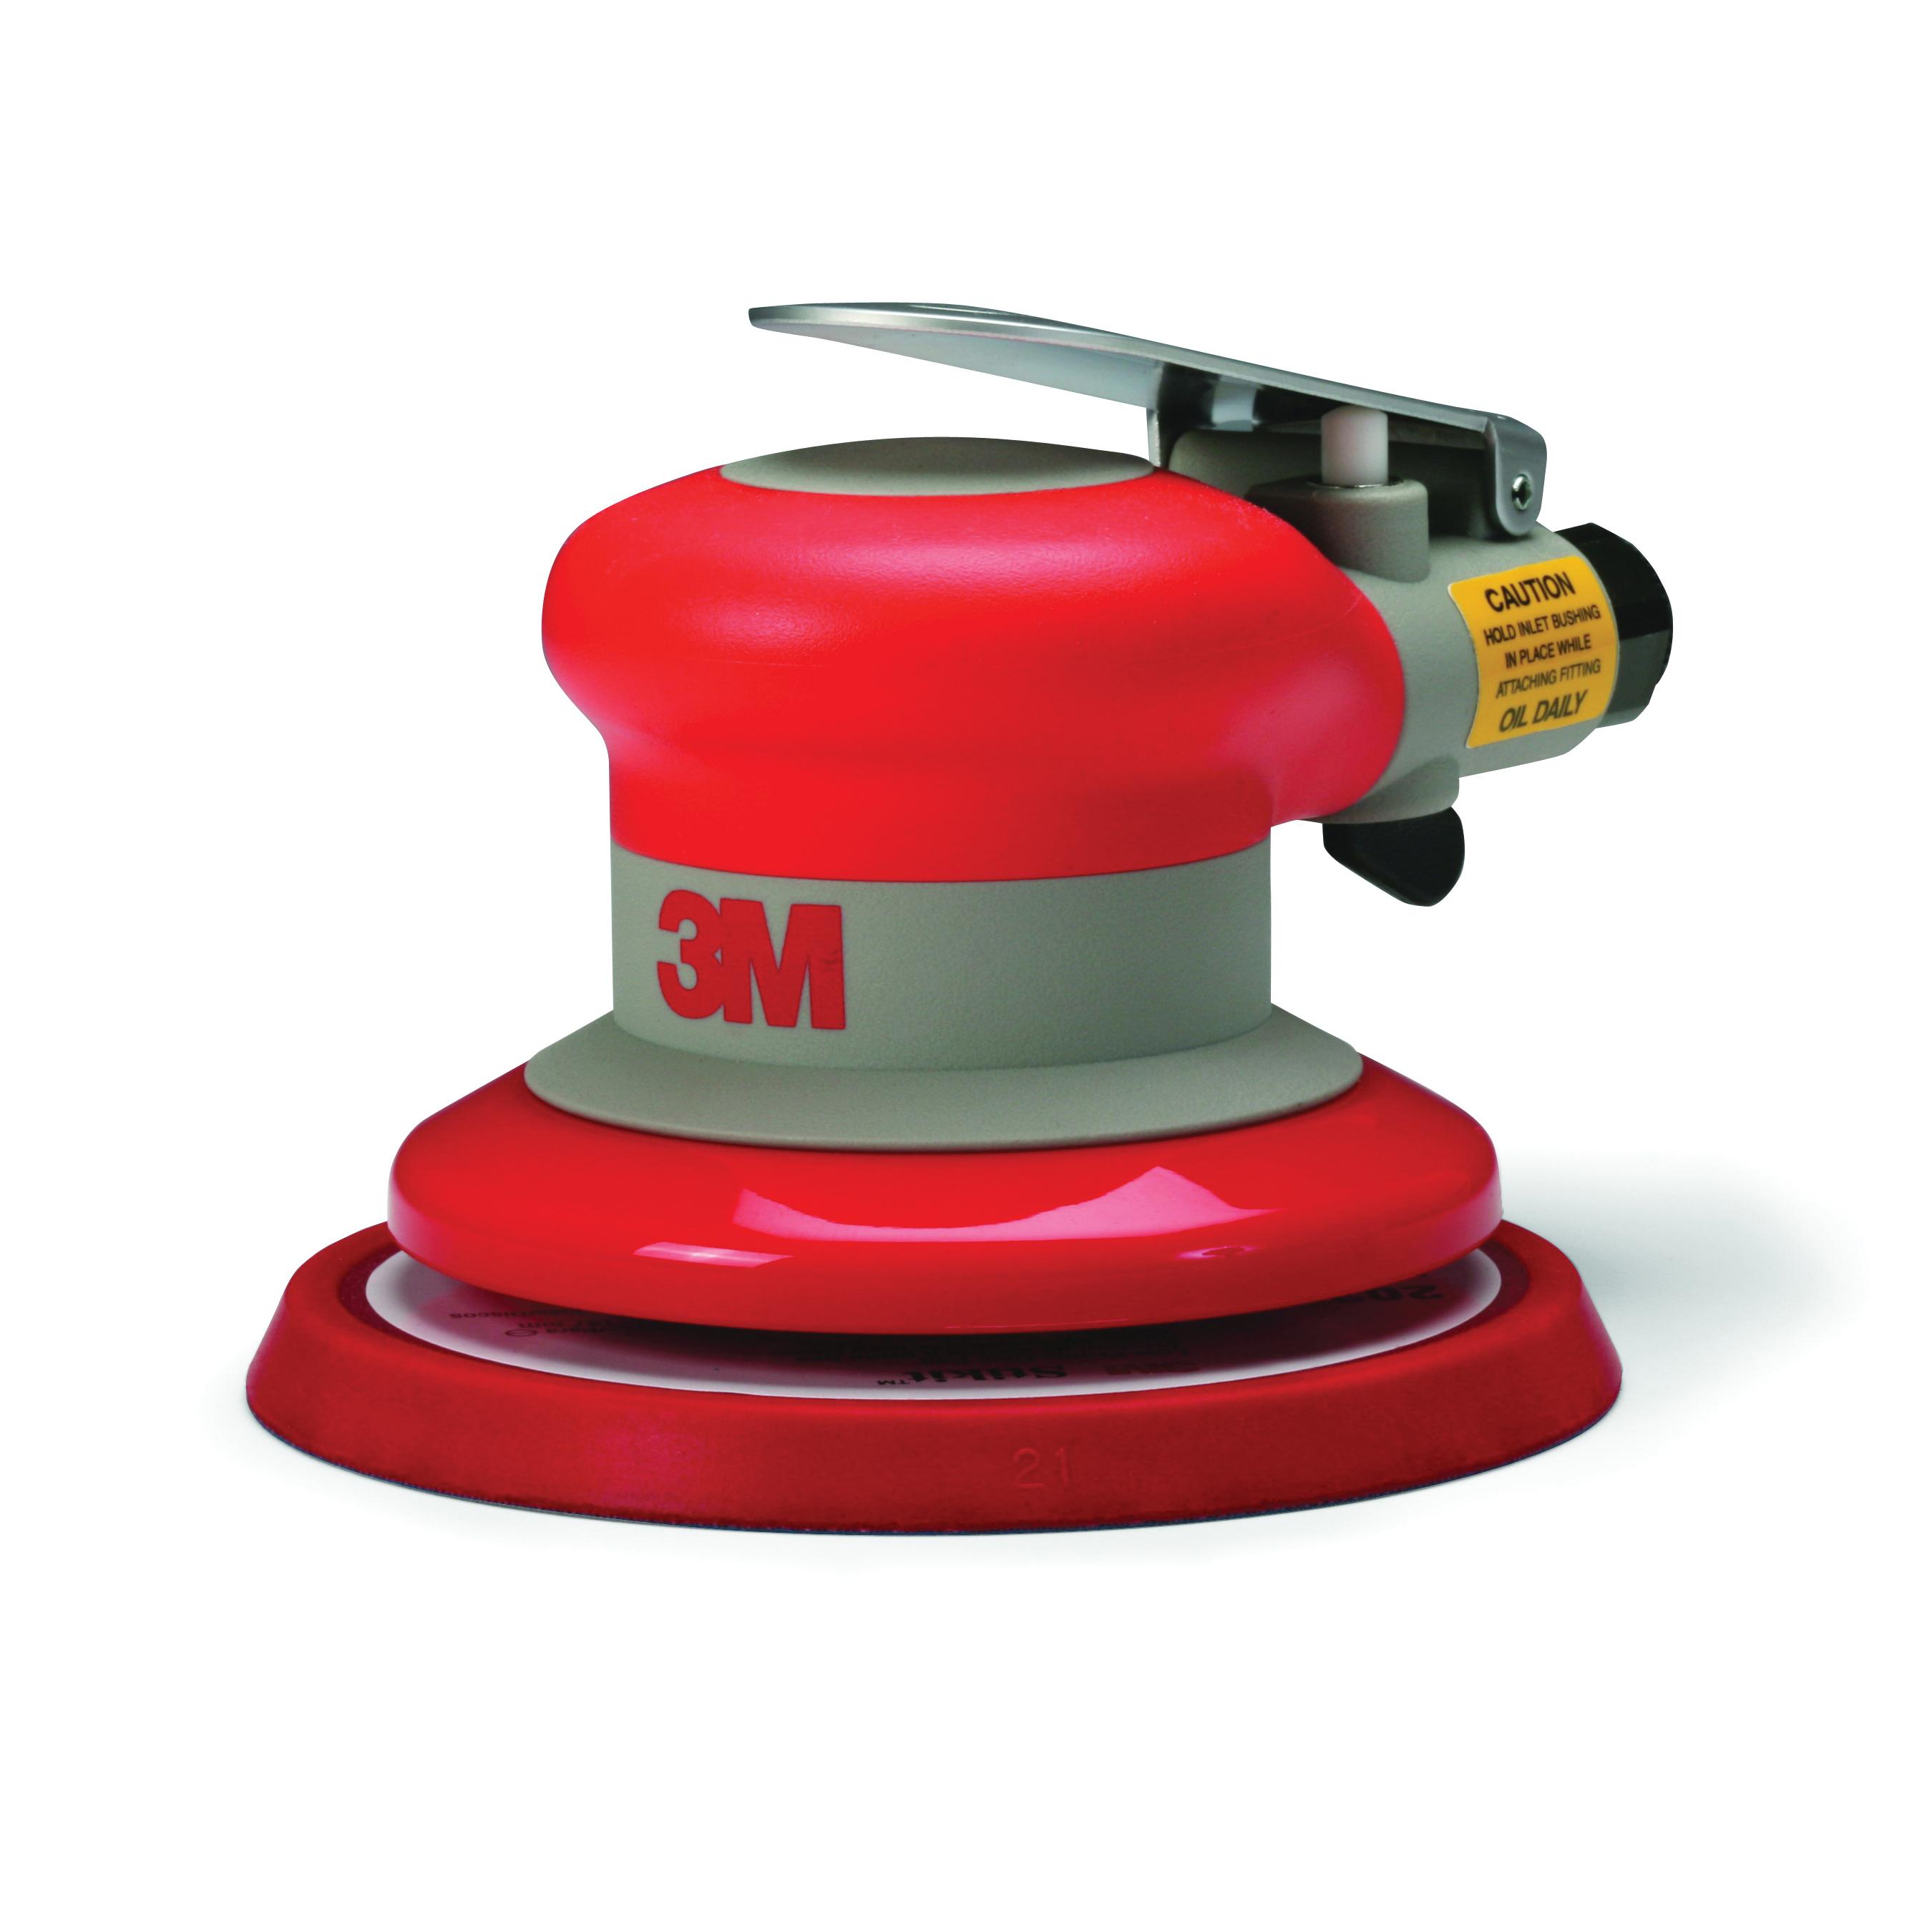 3M™ Elite® 051141-20317 Non-Vacuum Pneumatic Random Orbital Sander, 5 in Disc Pad, 17 scfm, Tool Only